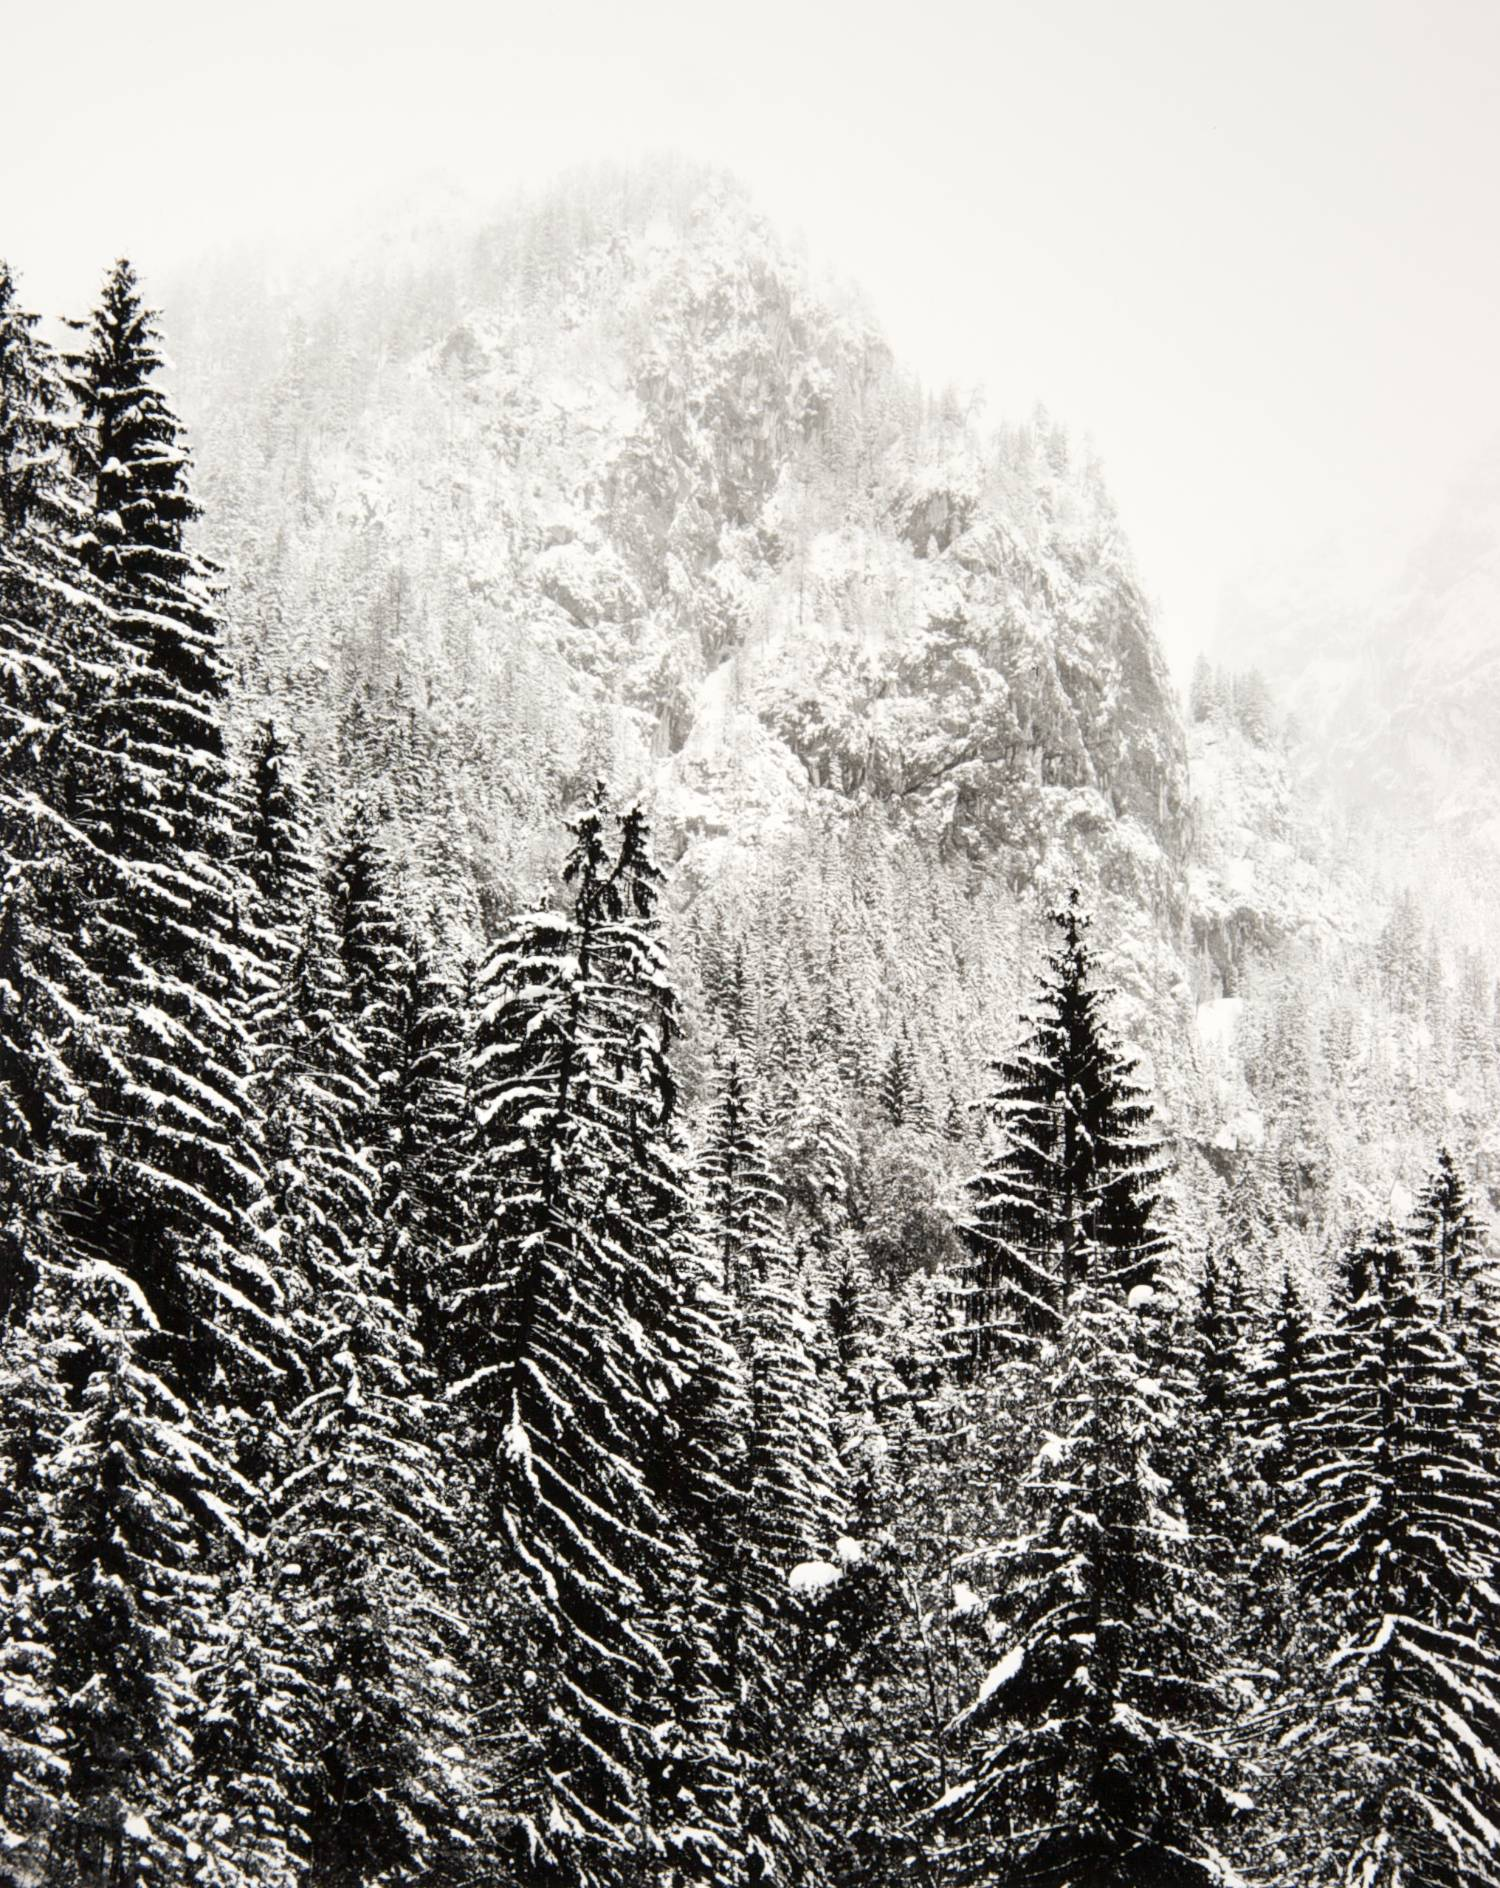 Bavarian Alps I (Berchtesgaden, Germany)